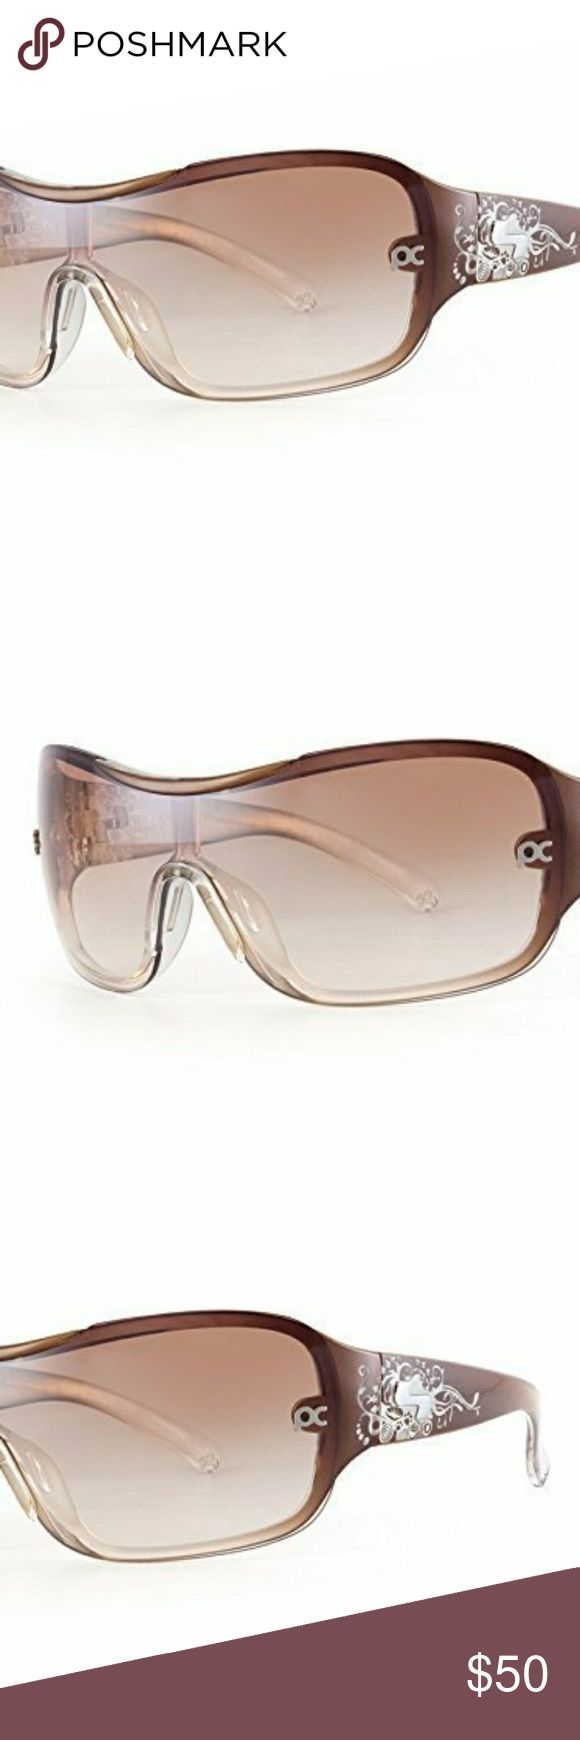 Sundog Paula Creamer Iconic golf sunglasses 493002 Brown gold fade, gradient brown lens, Polycarbonate 100% UVA/UVB protection  with Max flex Rilsan. Sells for $103 on eBay, $60 on Amazon  NWOT sundog Accessories Sunglasses